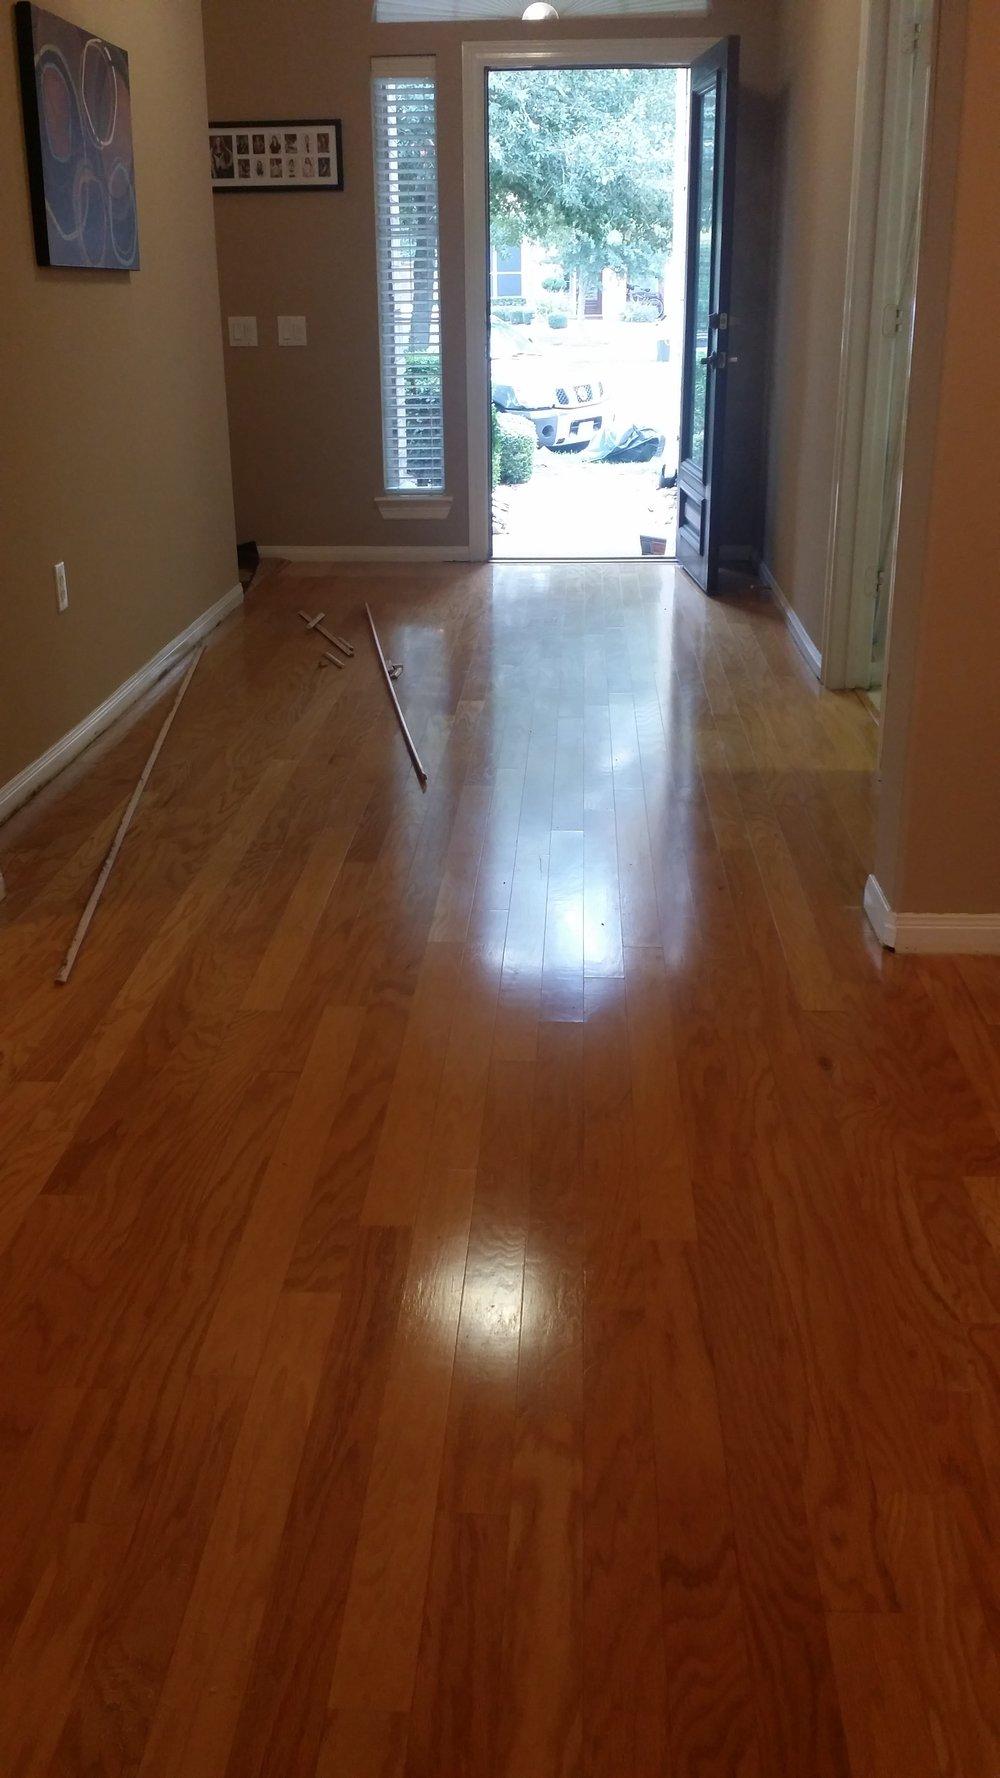 Karen E. Engineered Floor Refinished U2014 Houston Hardwood Floor Refinishing  Installations